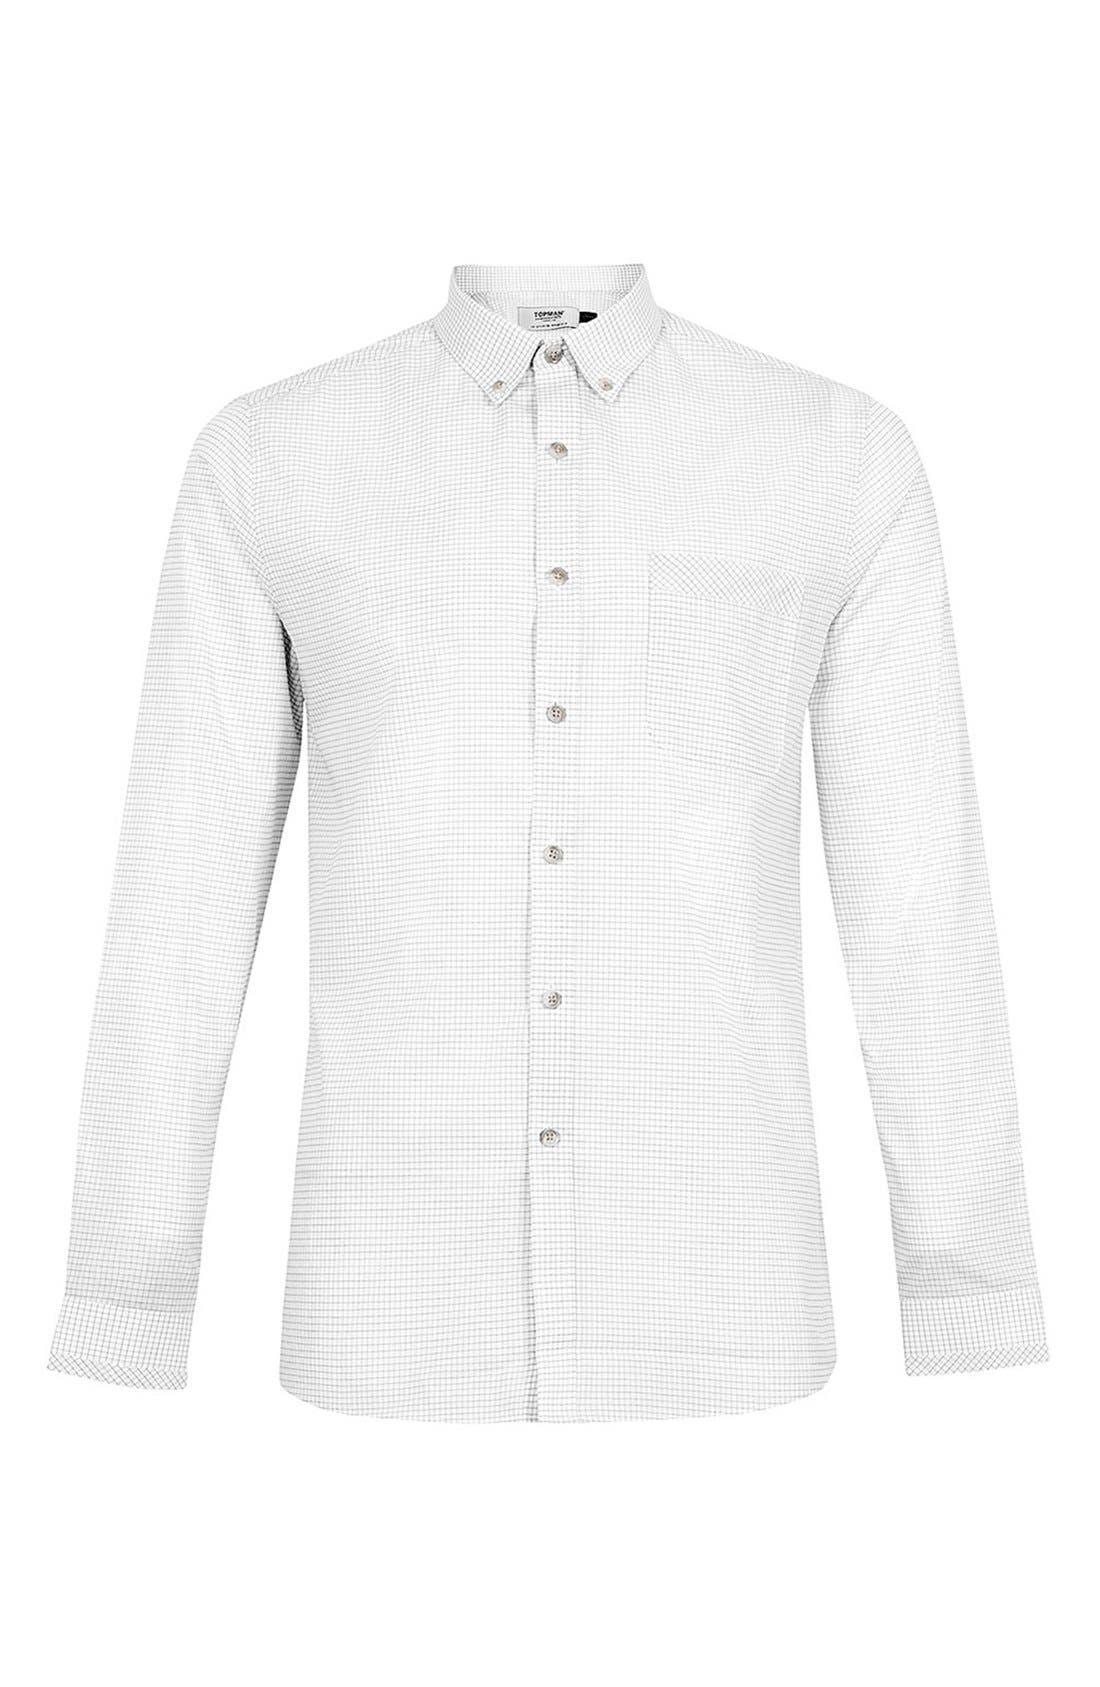 Main Image - Topman Check Sport Shirt